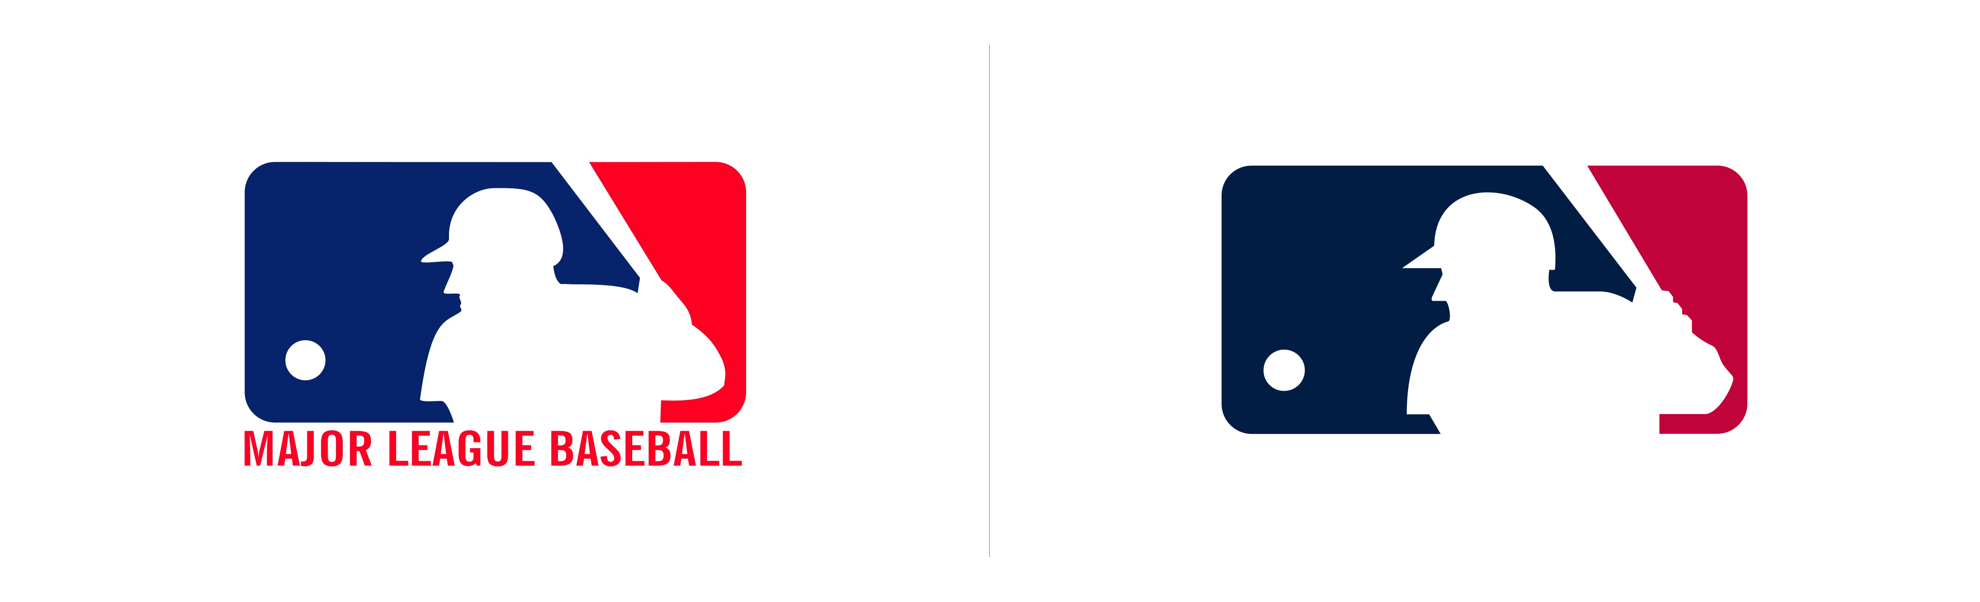 mlb zmienia logo